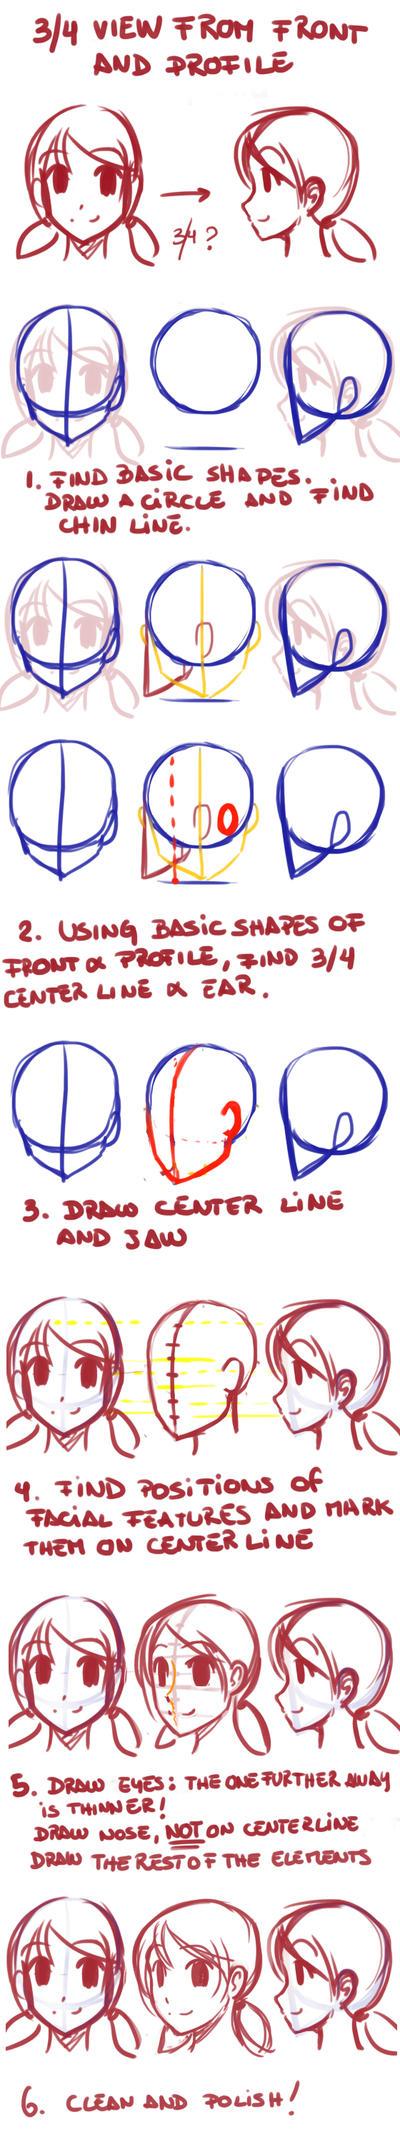 Drawing 3-4 view by DejiNyucu